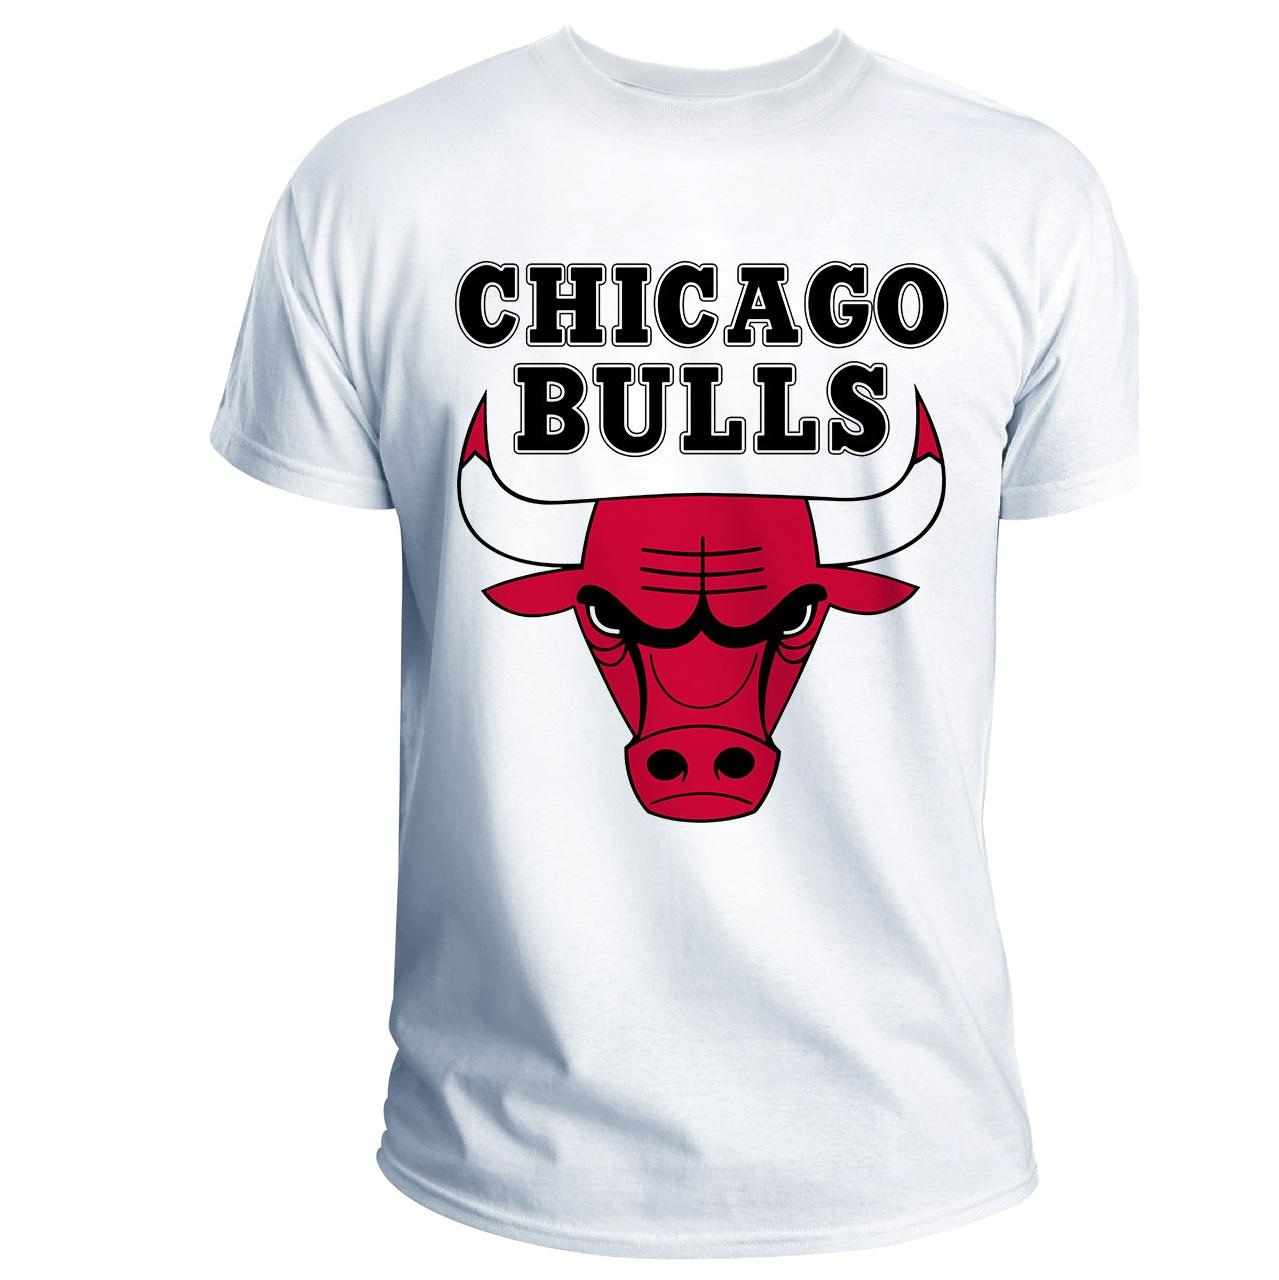 تی شرت انارچاپ طرح شیکاگو بولز مدل T05002